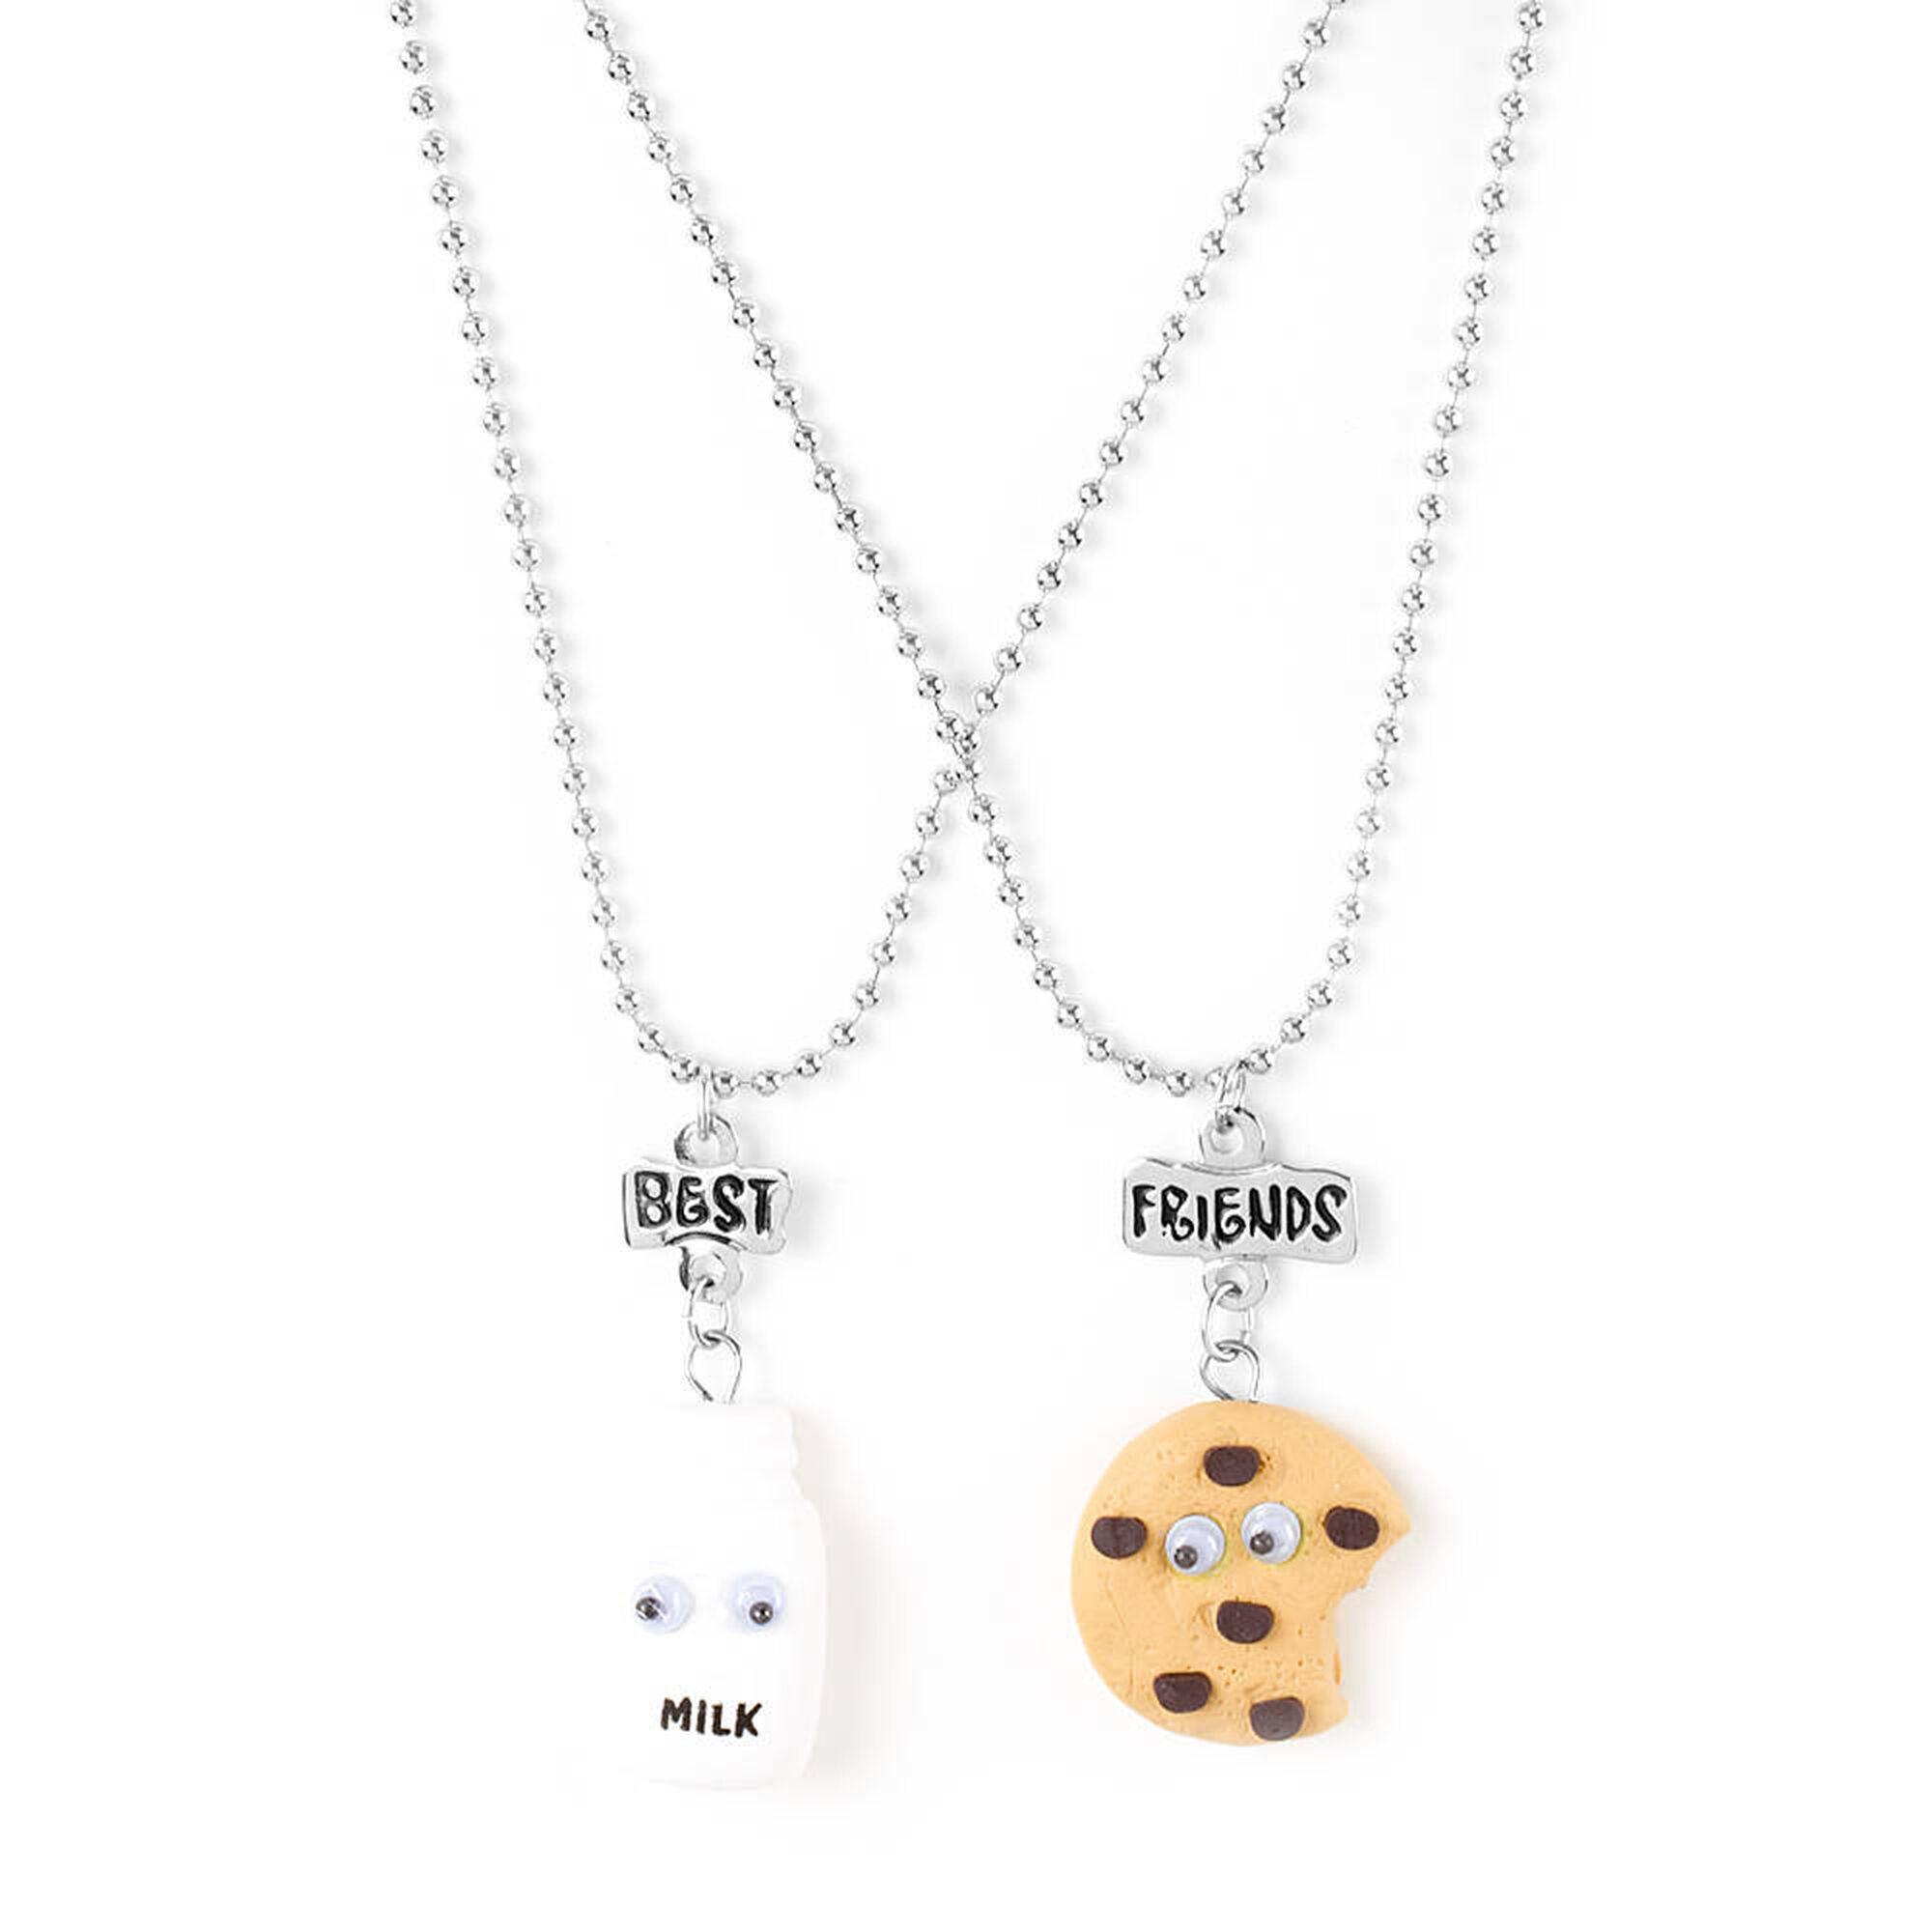 Best friends googly eye milk cookie pendant necklaces claires us best friends googly eye milk amp cookie pendant necklaces mozeypictures Choice Image